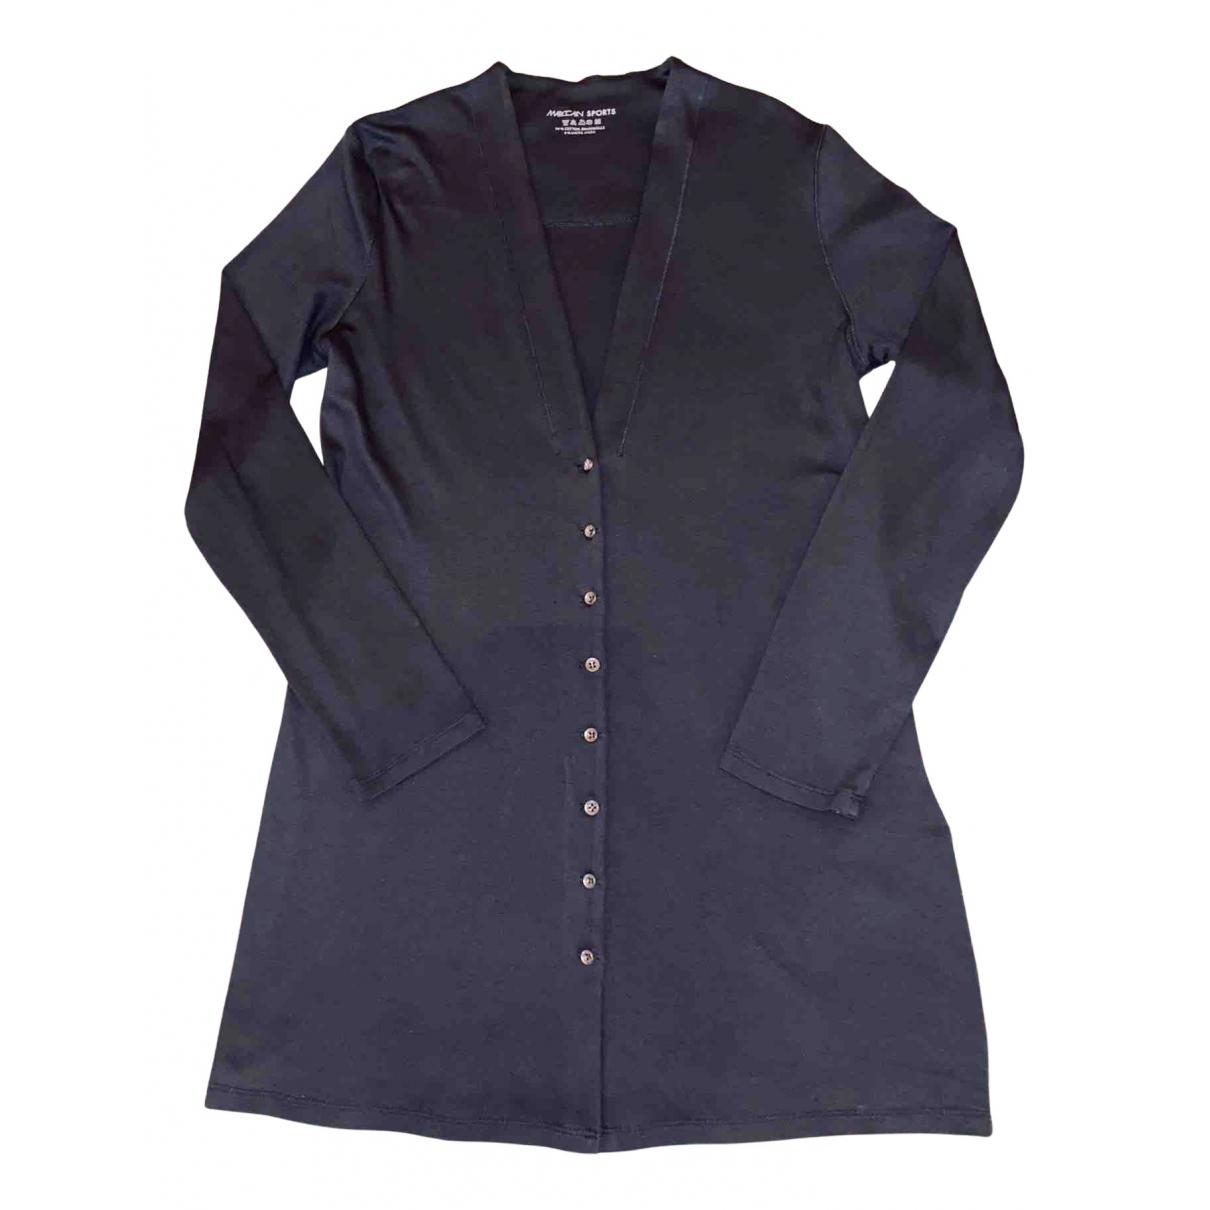 Marc Cain N Grey Cotton Knitwear for Women M International